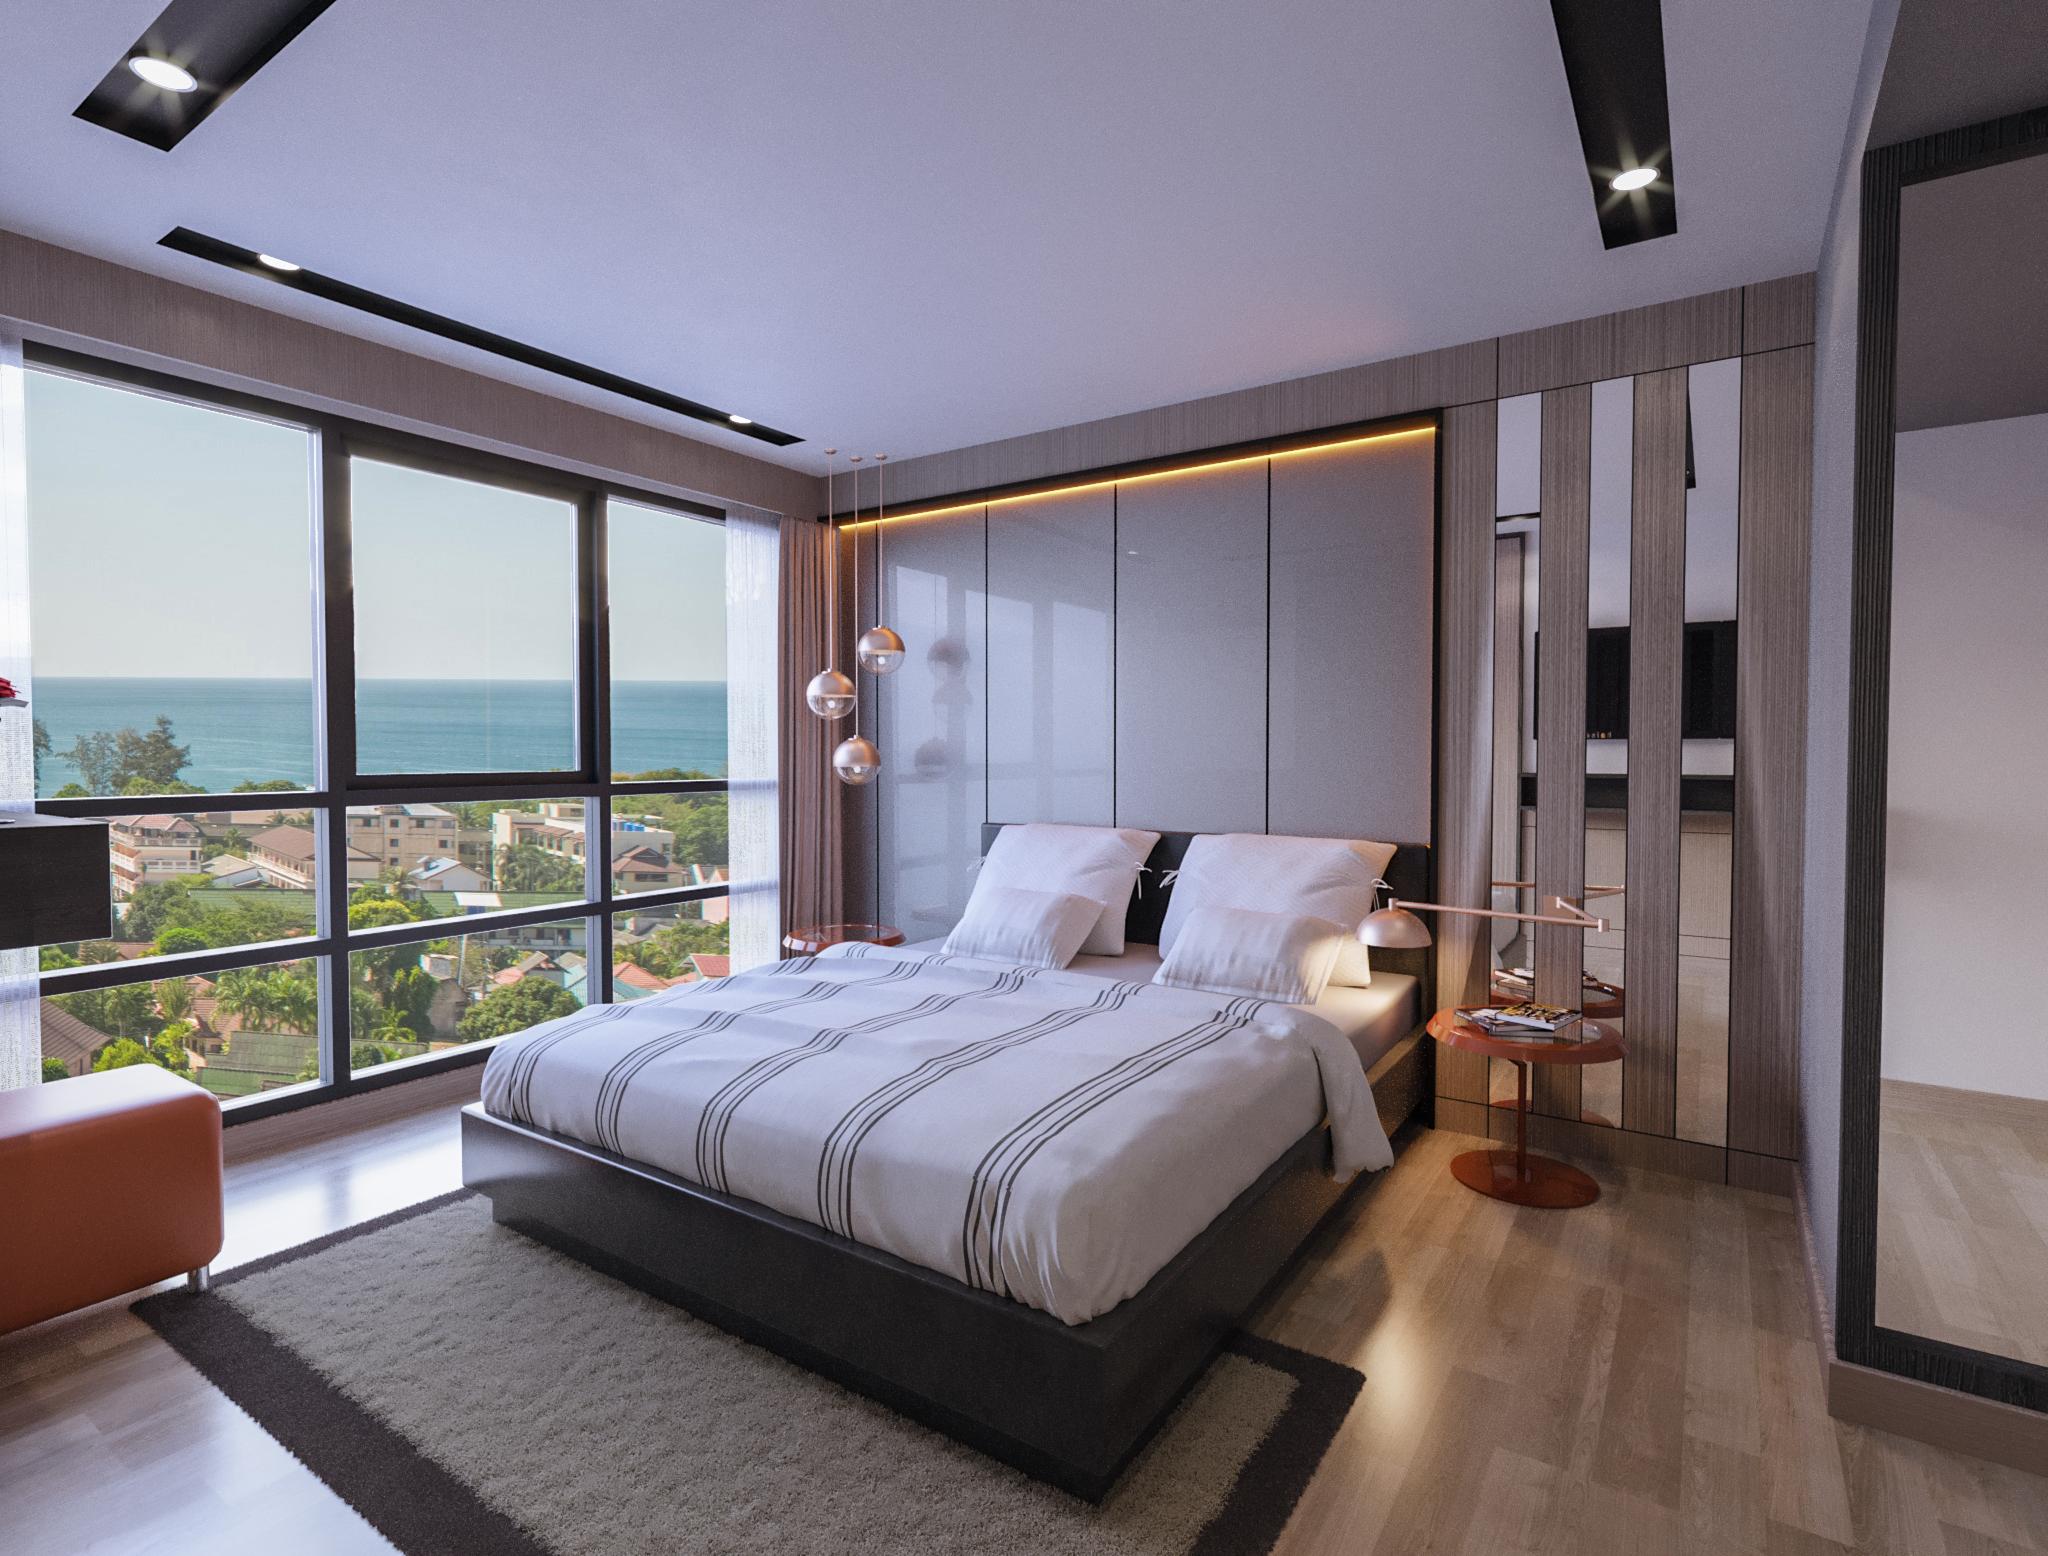 Seaview bedroom in VIPKaron by Phuket9